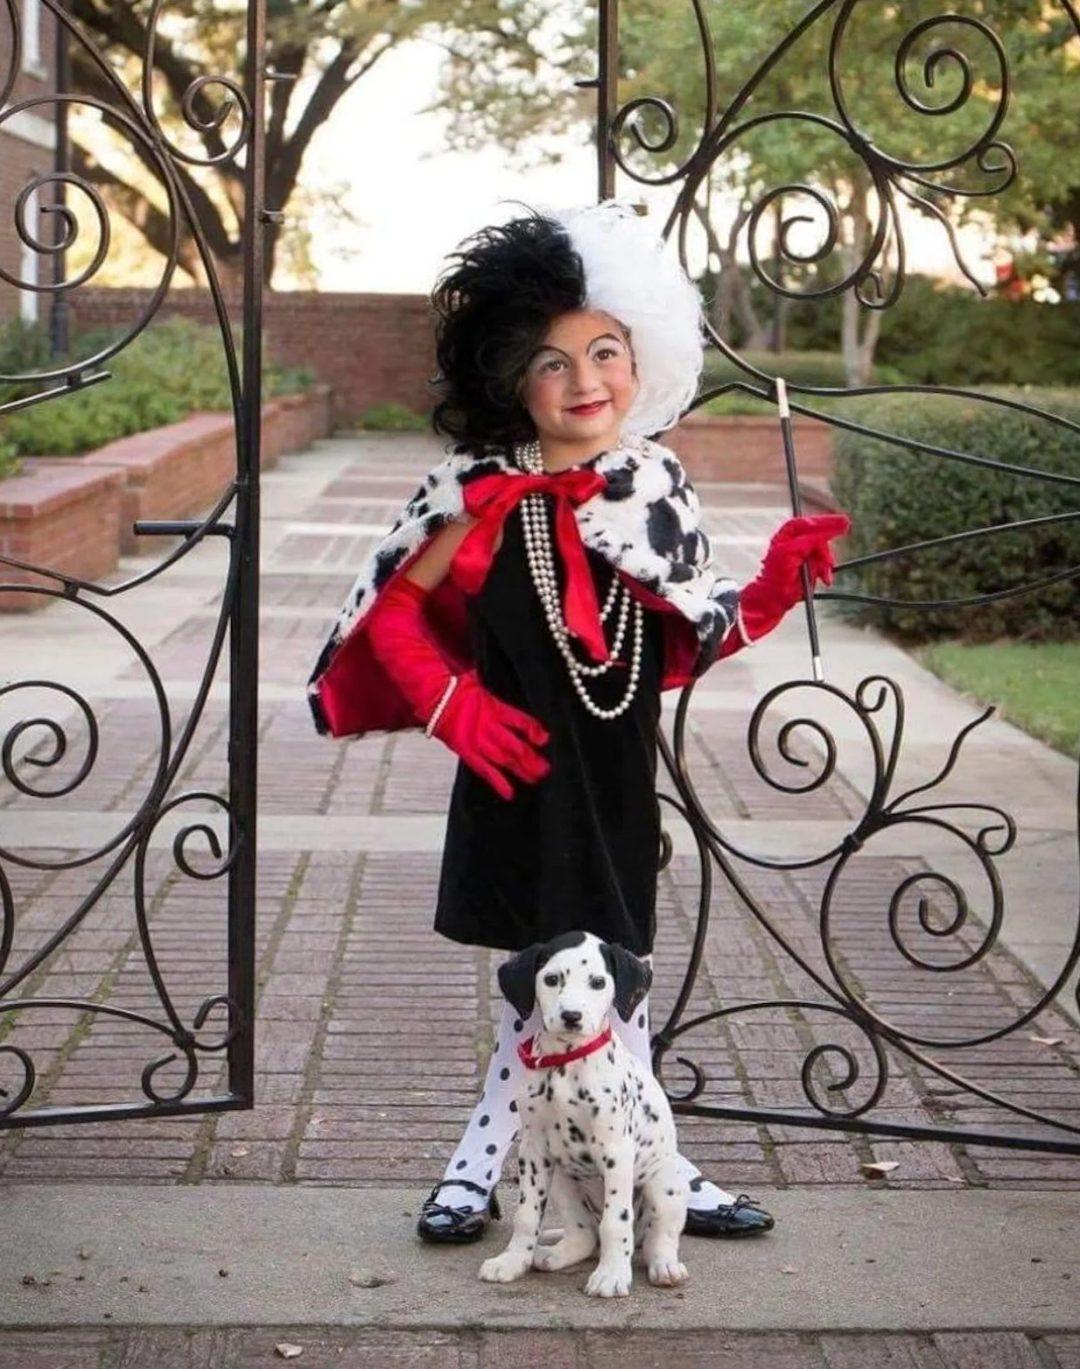 Cruella De Vil toddler Halloween costume